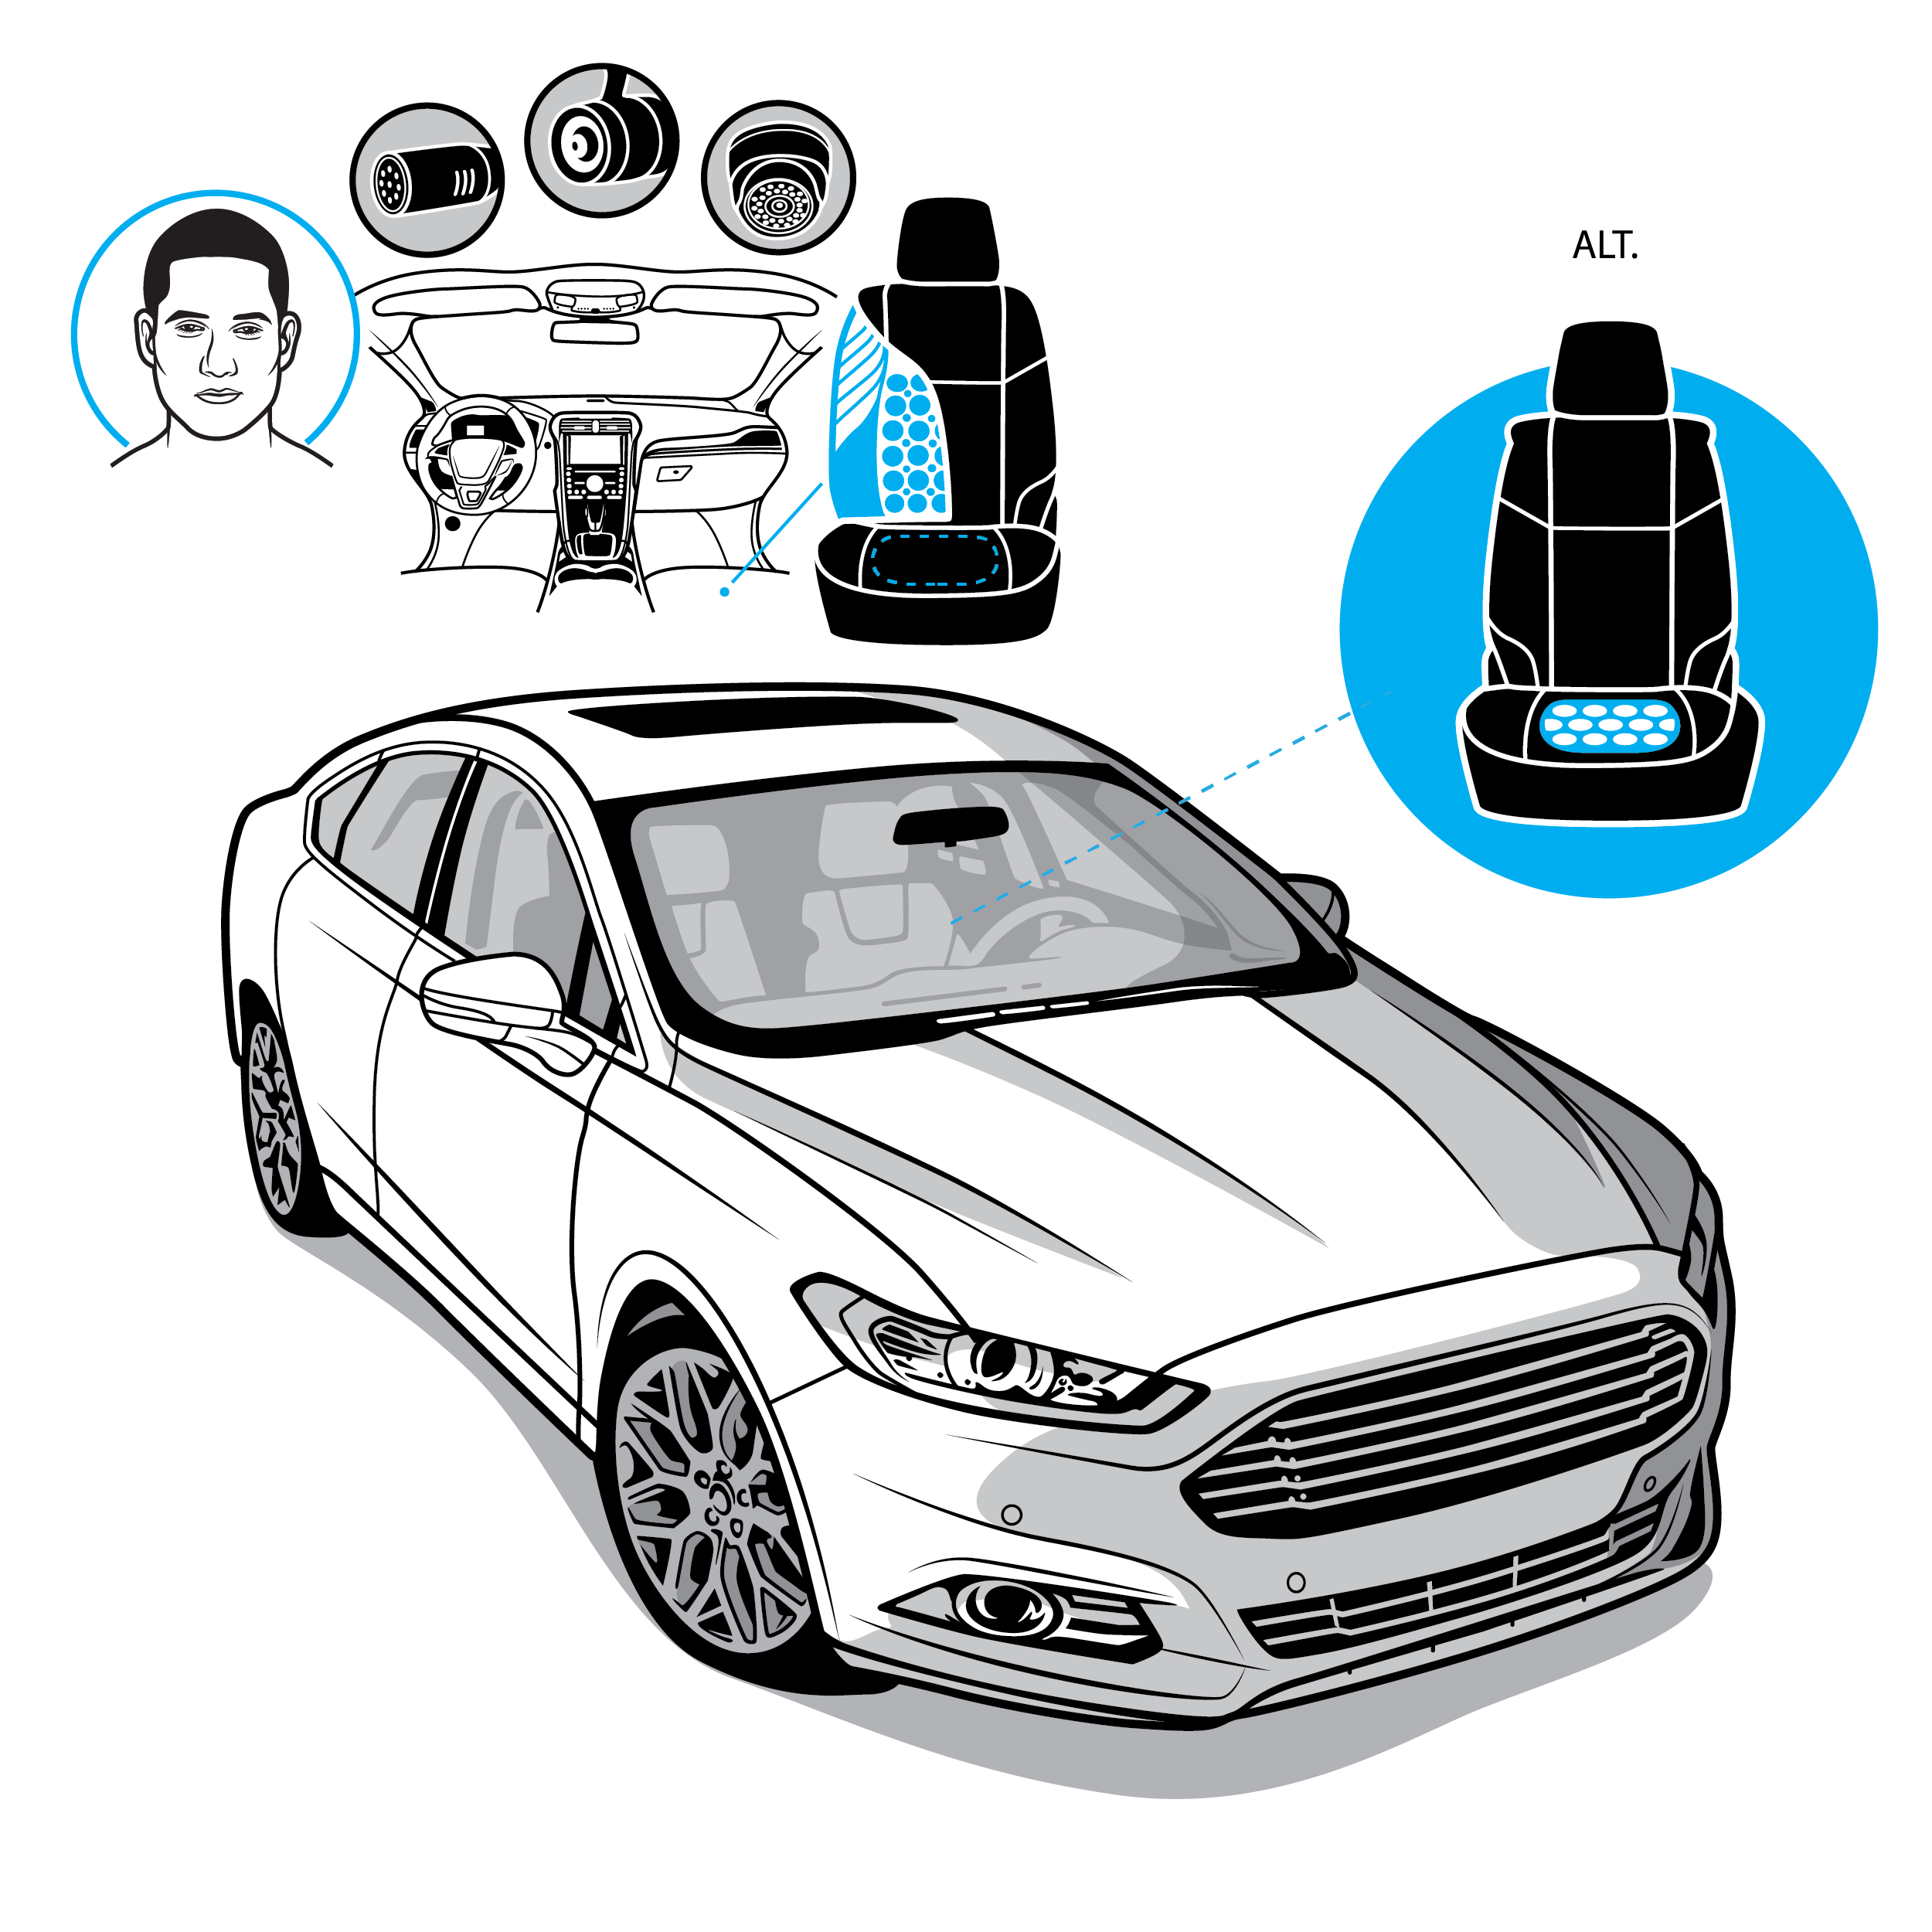 TIME_Smart_Car__trans-01.png